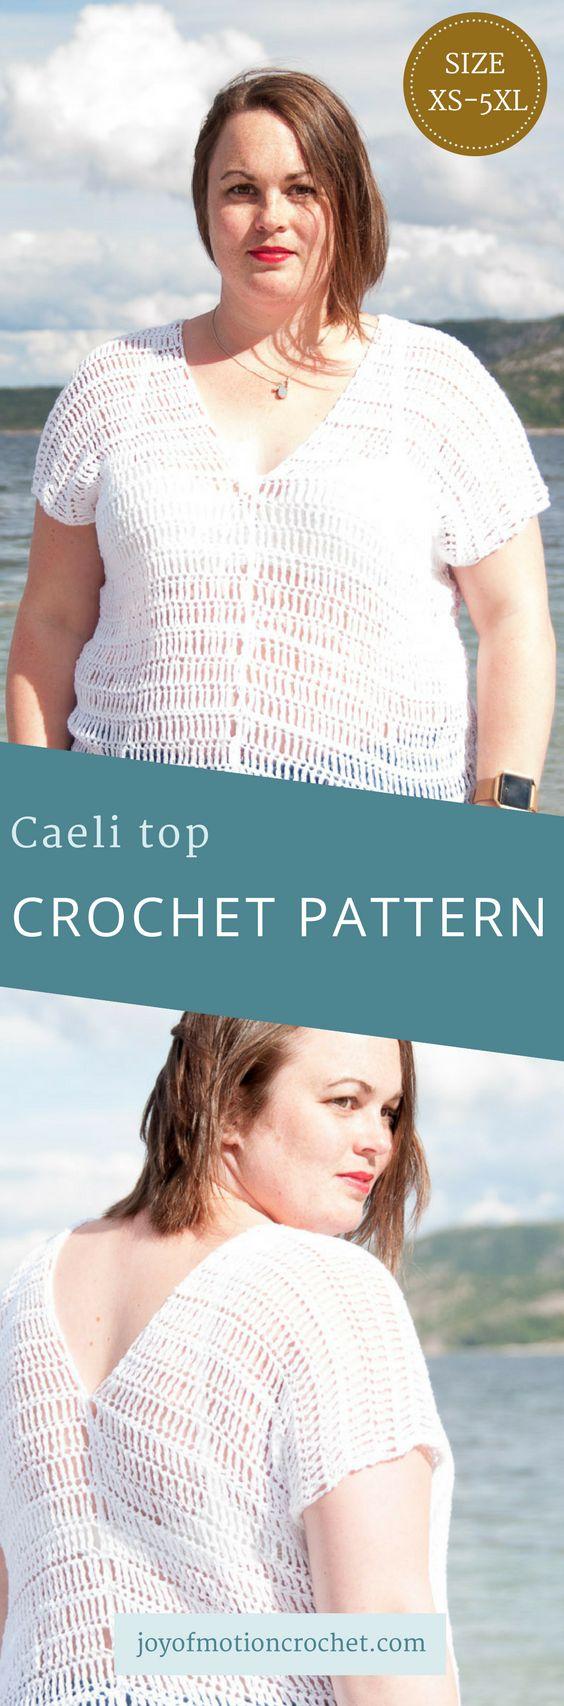 Caeli Top Crochet Pattern. Woman's crochet garment. Crochet Clothing. Summer Crochet Top. Crochet t-shirt. #crochettop #crochetclothing #crochet #crochetpattern #crochettshirt